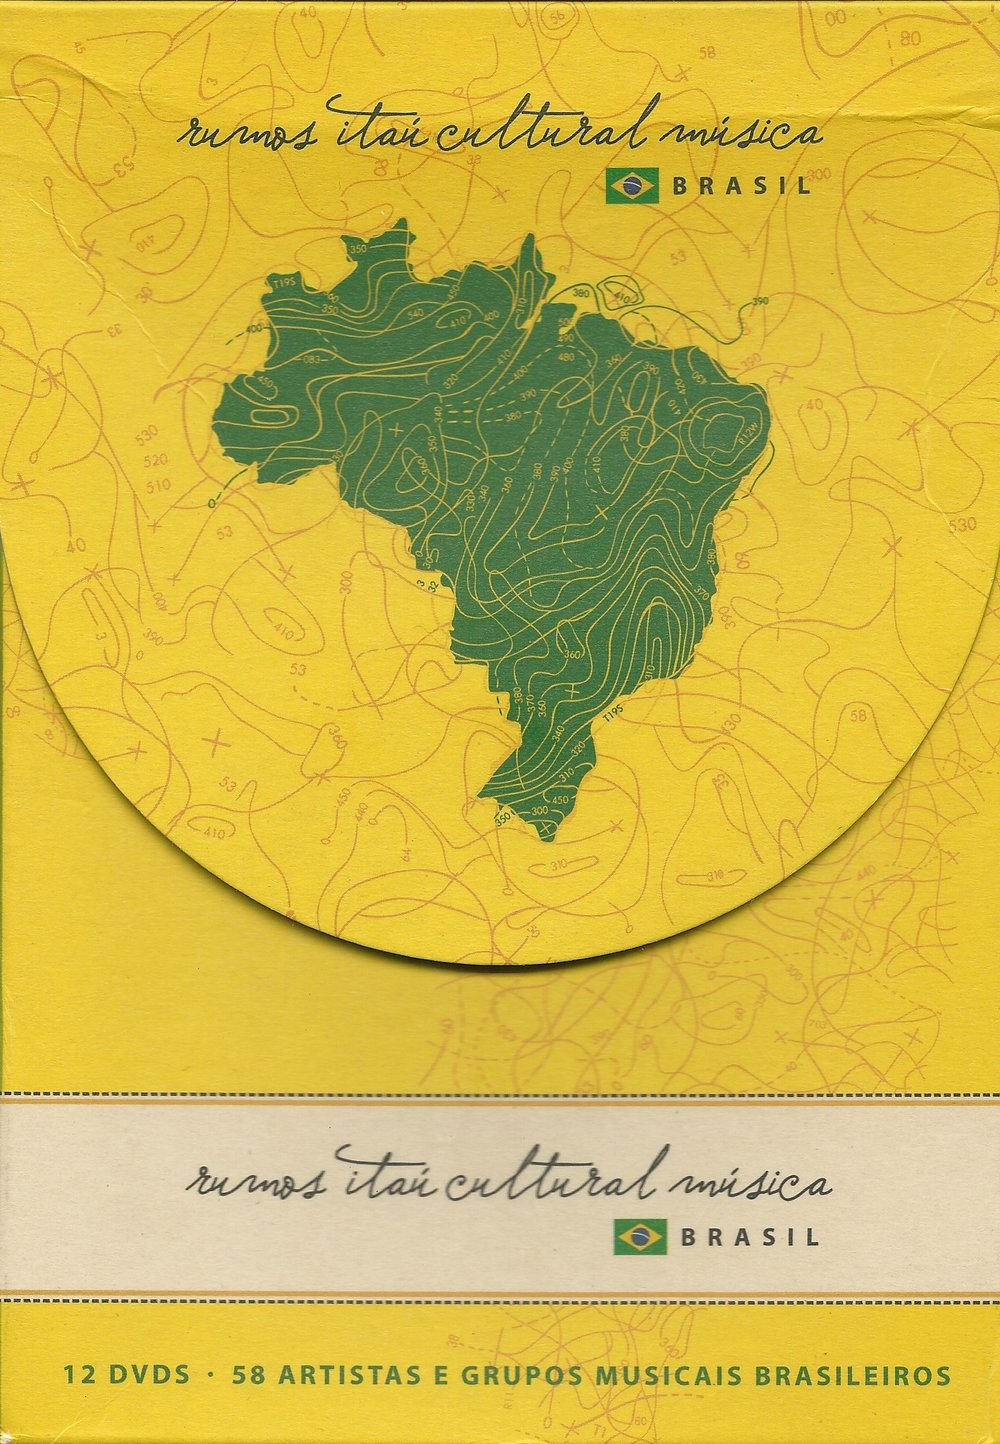 48 2009 DVD Rumos Itau Cultural Musica - Brasil.jpg